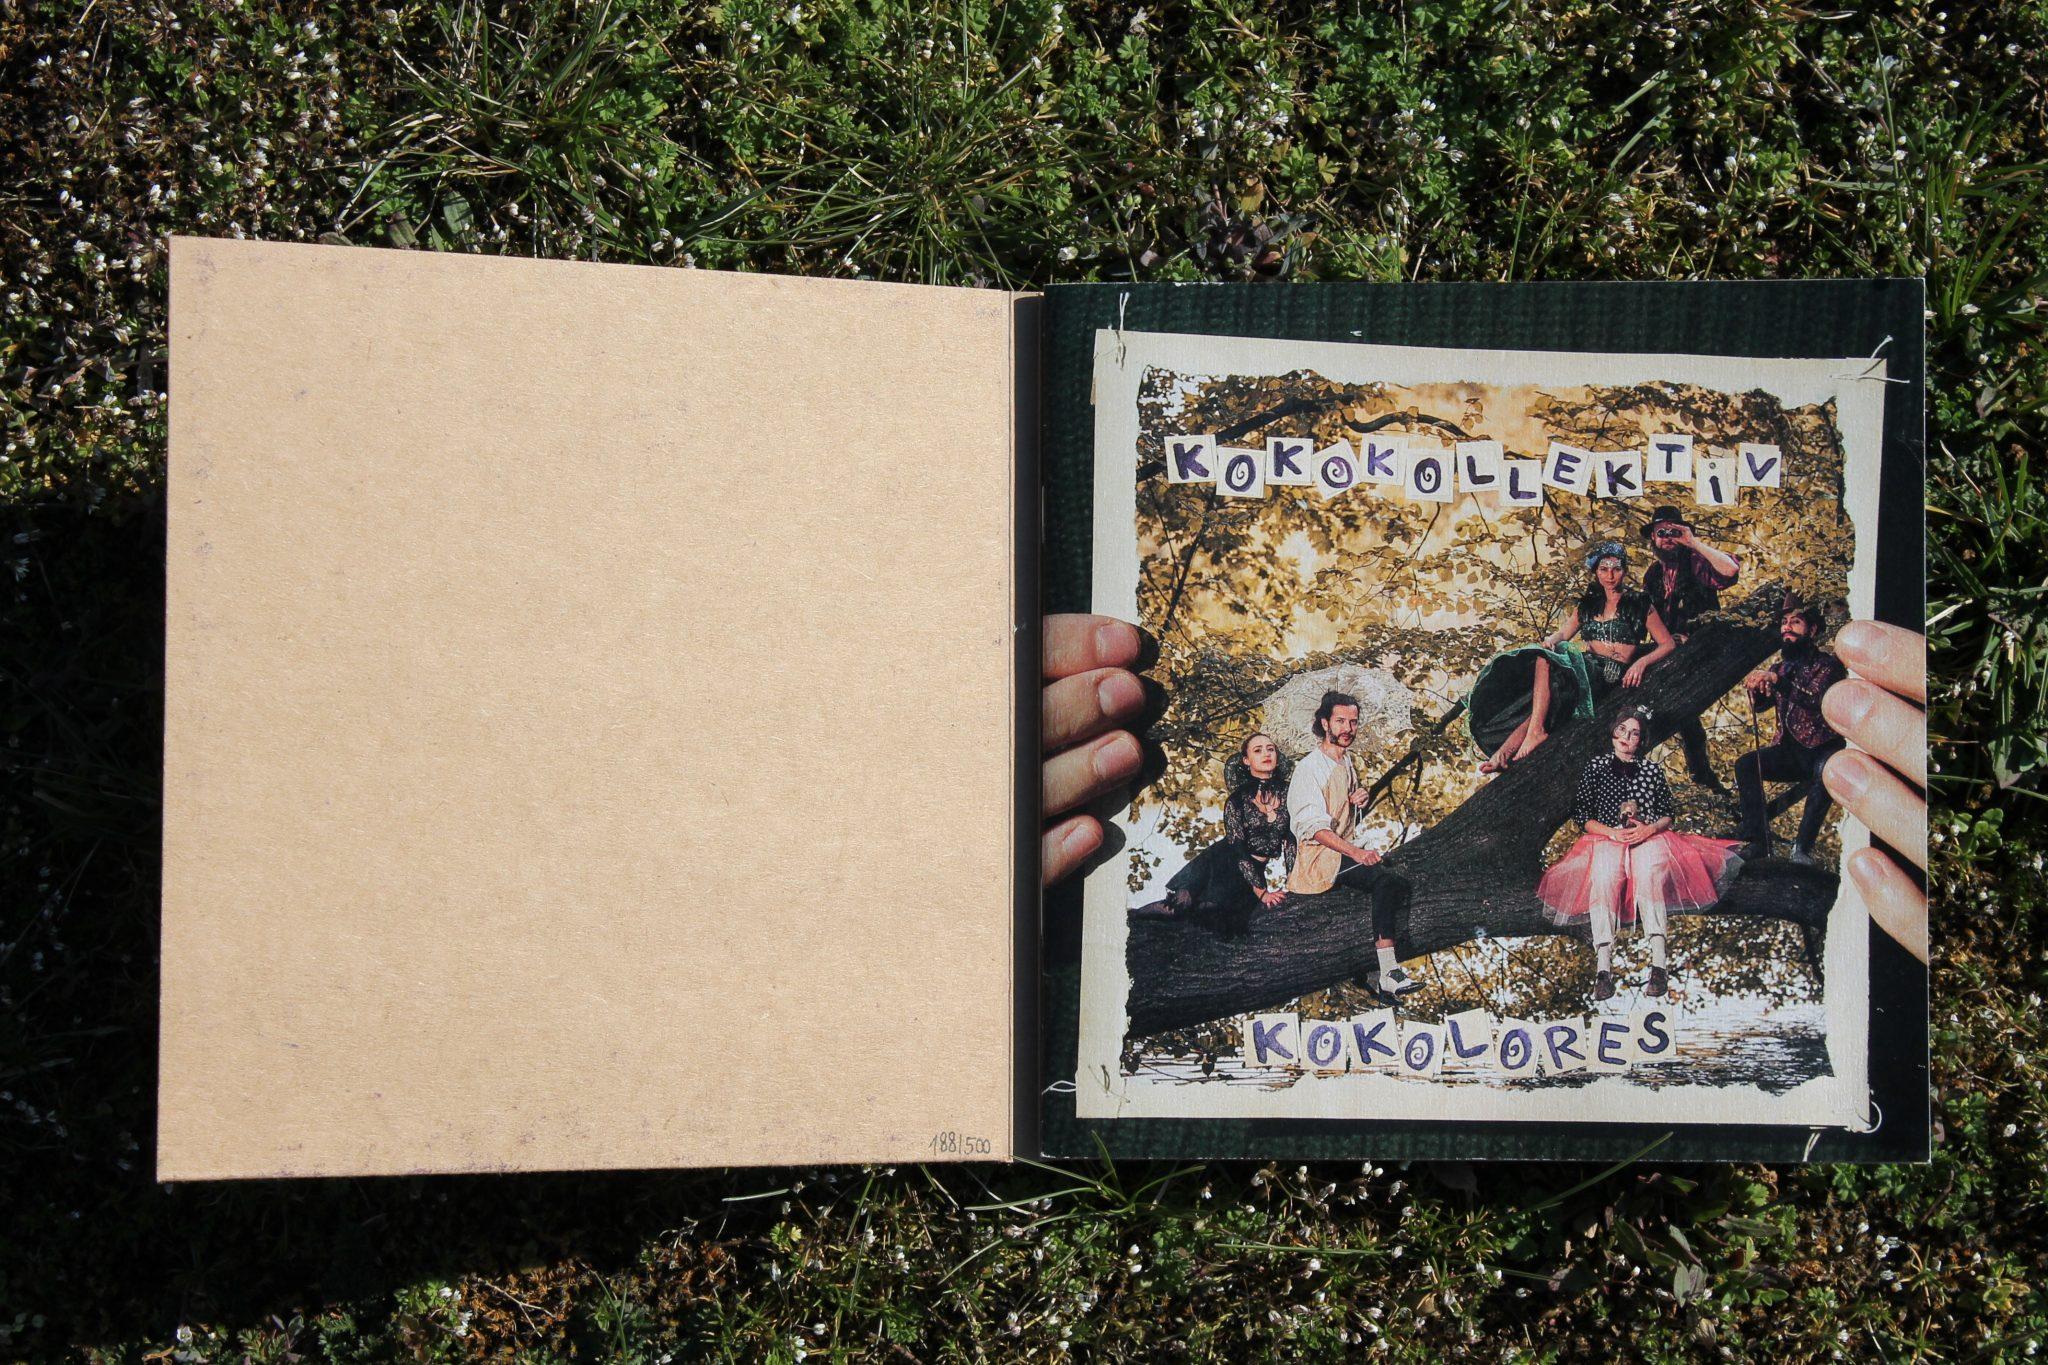 booklet scaled - Kokokollektiv